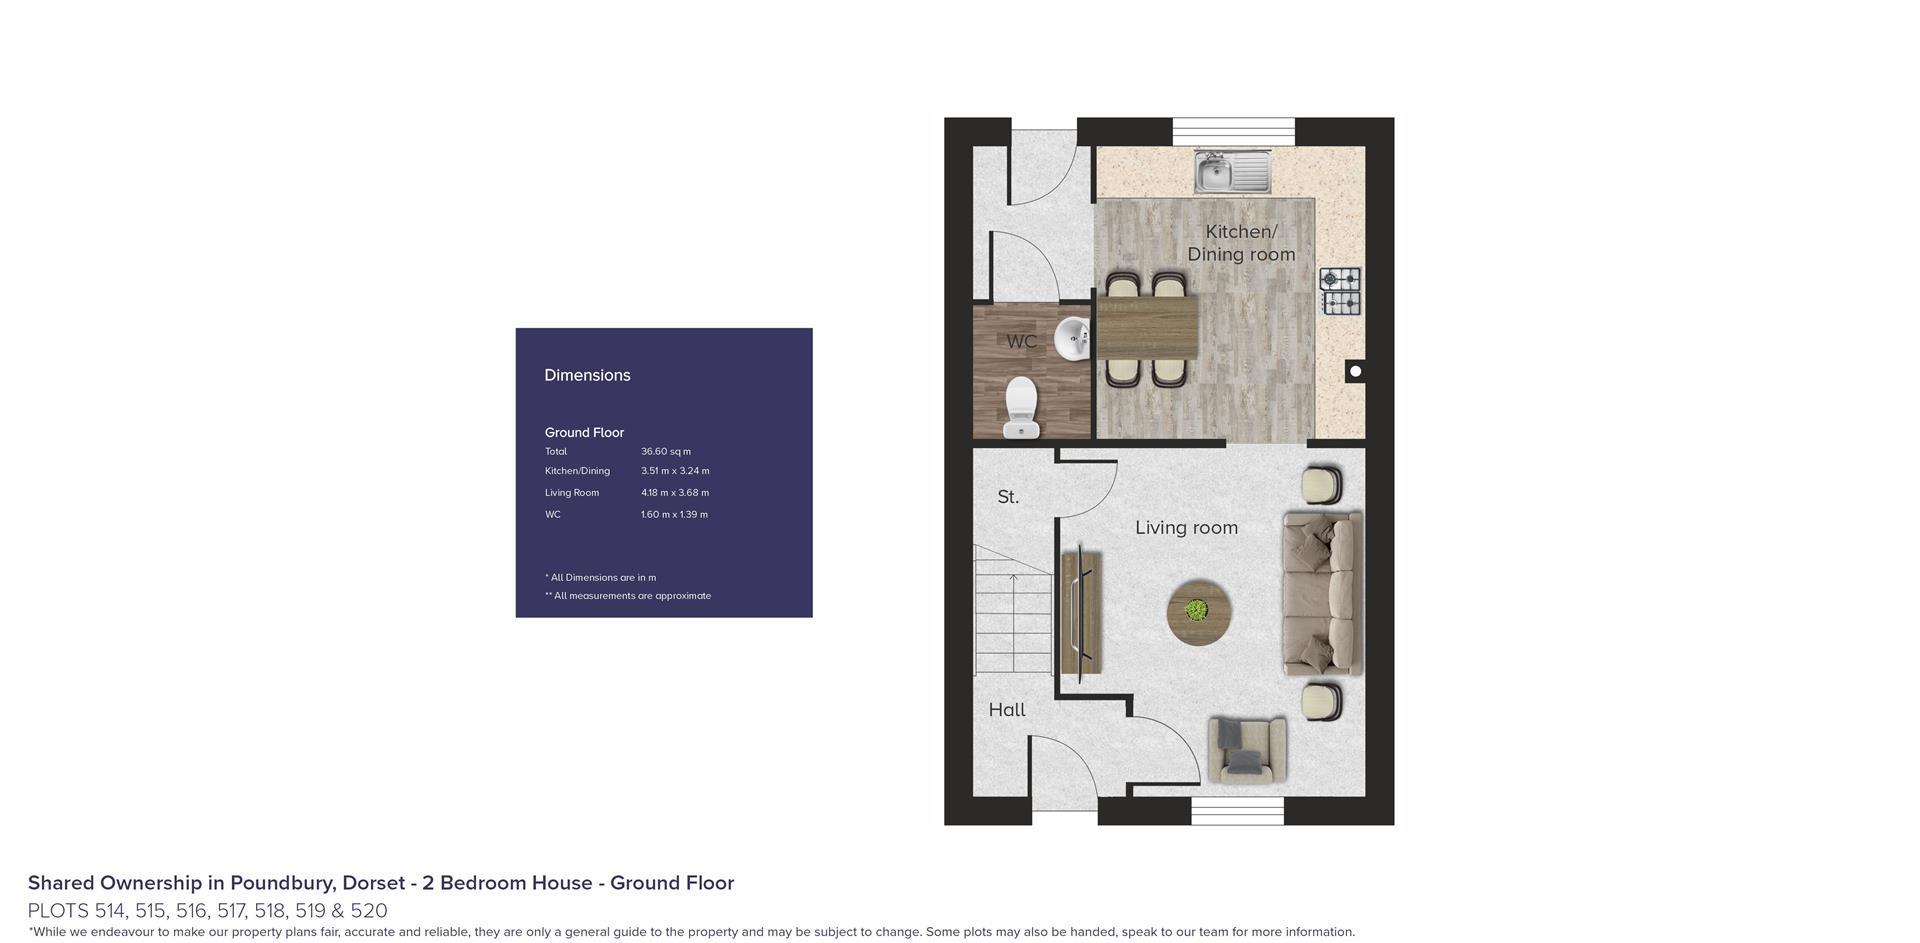 Shared Ownership in Poundbury, Dorset_Plots 514, 5